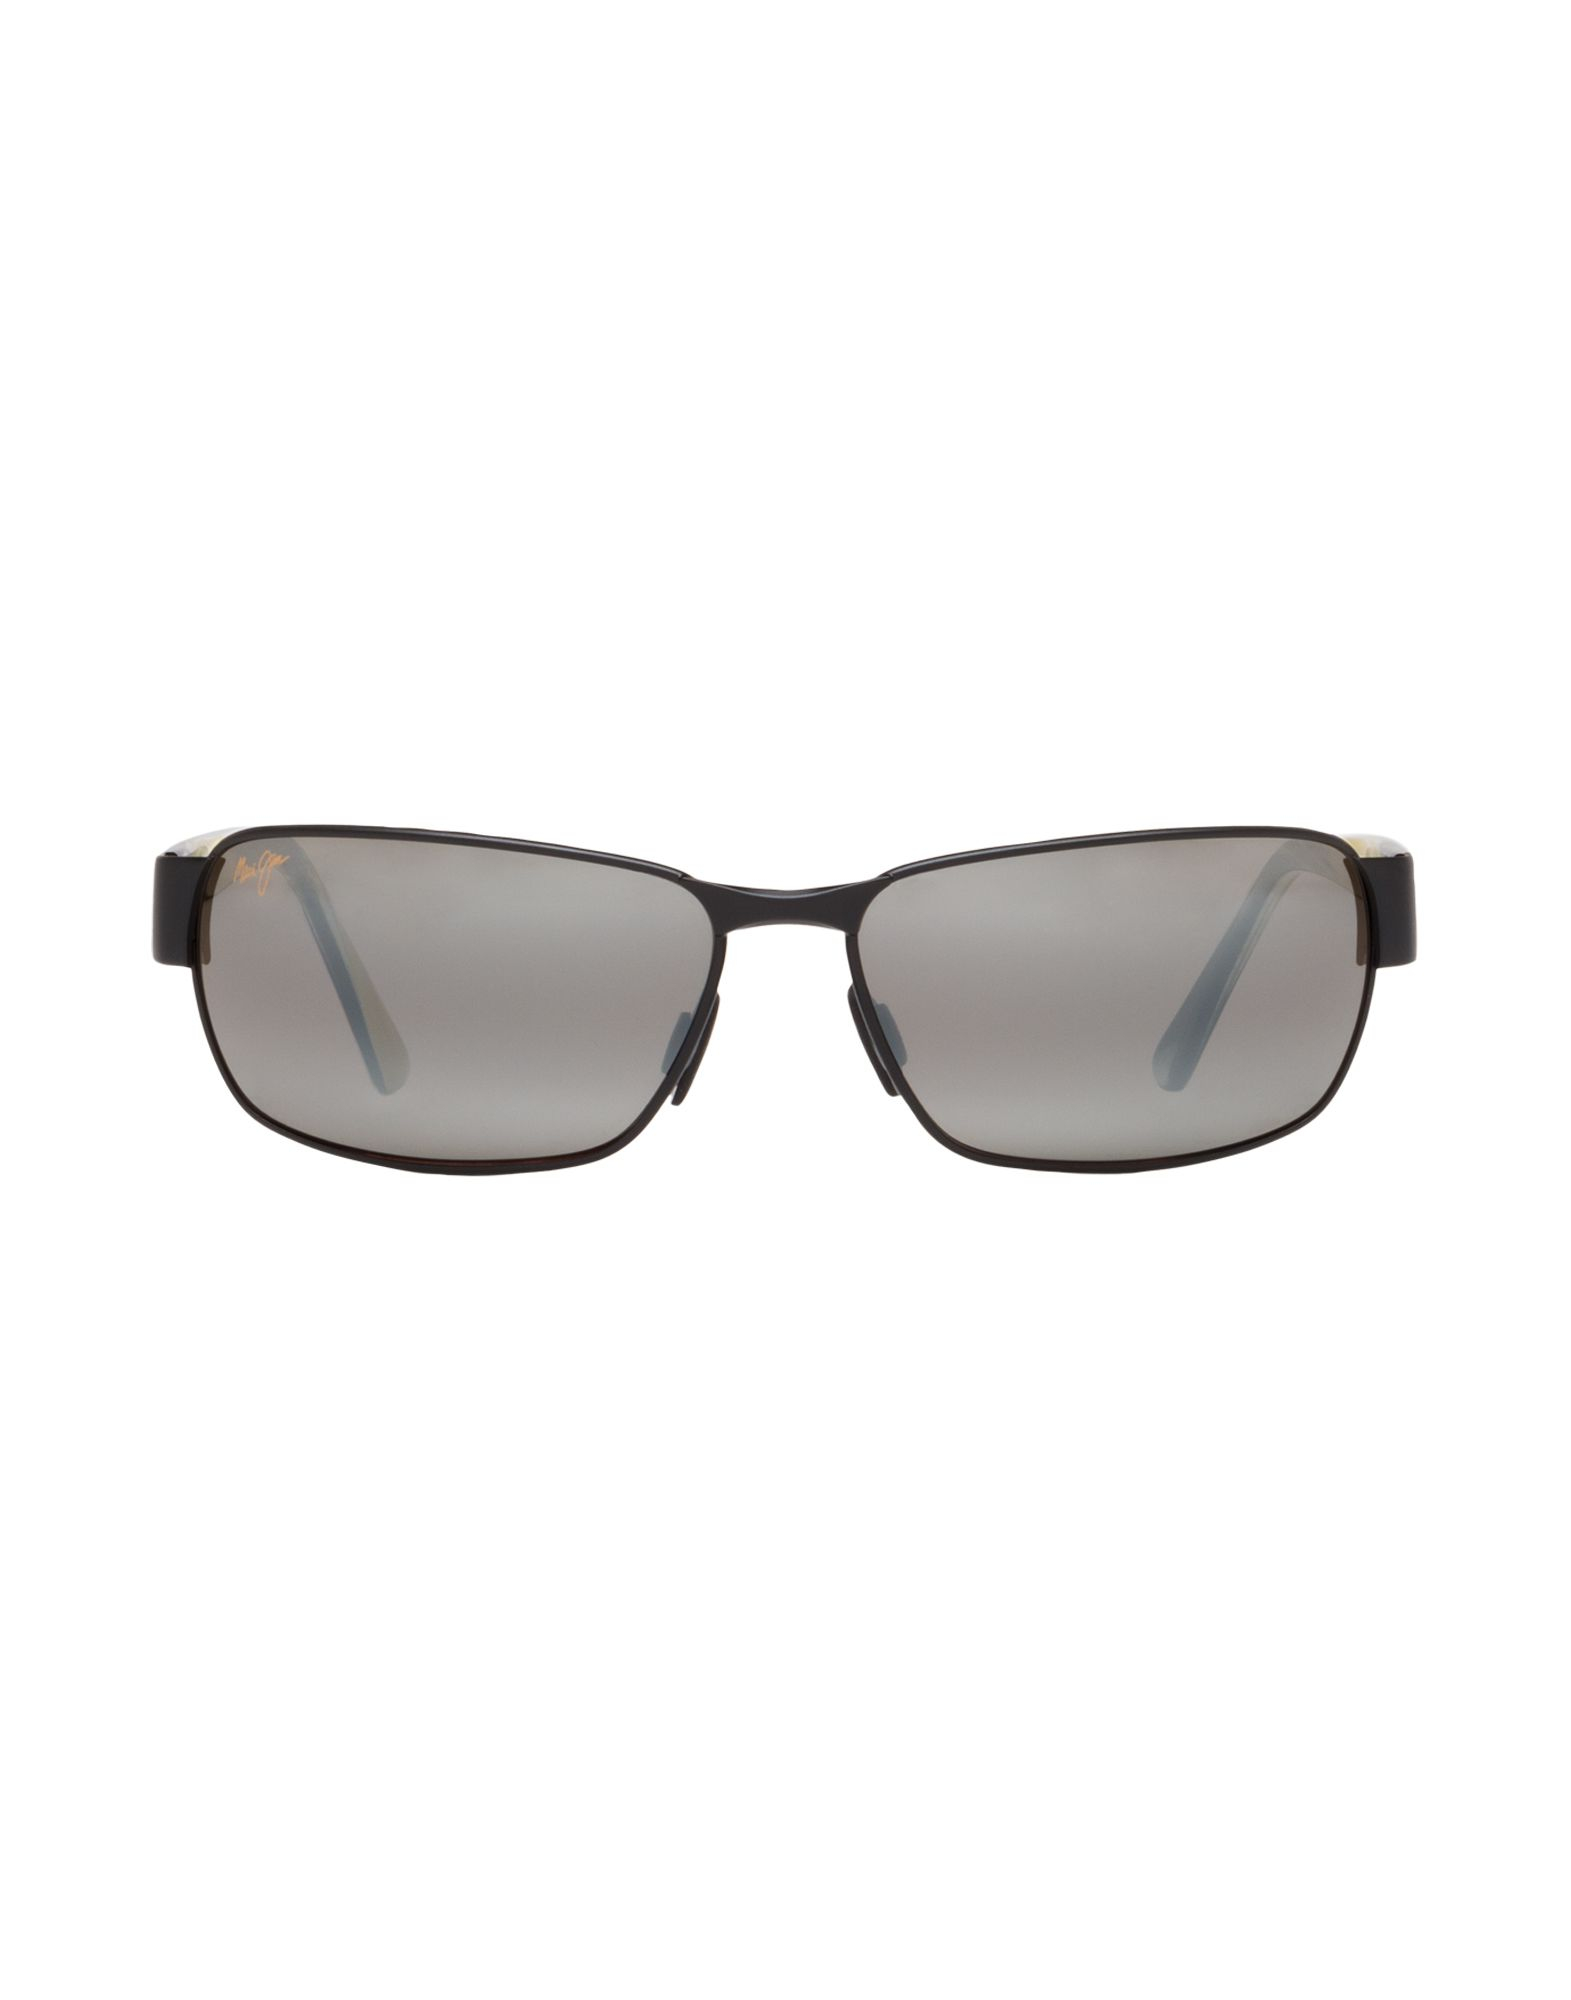 Maui jim Sunglasses in Black